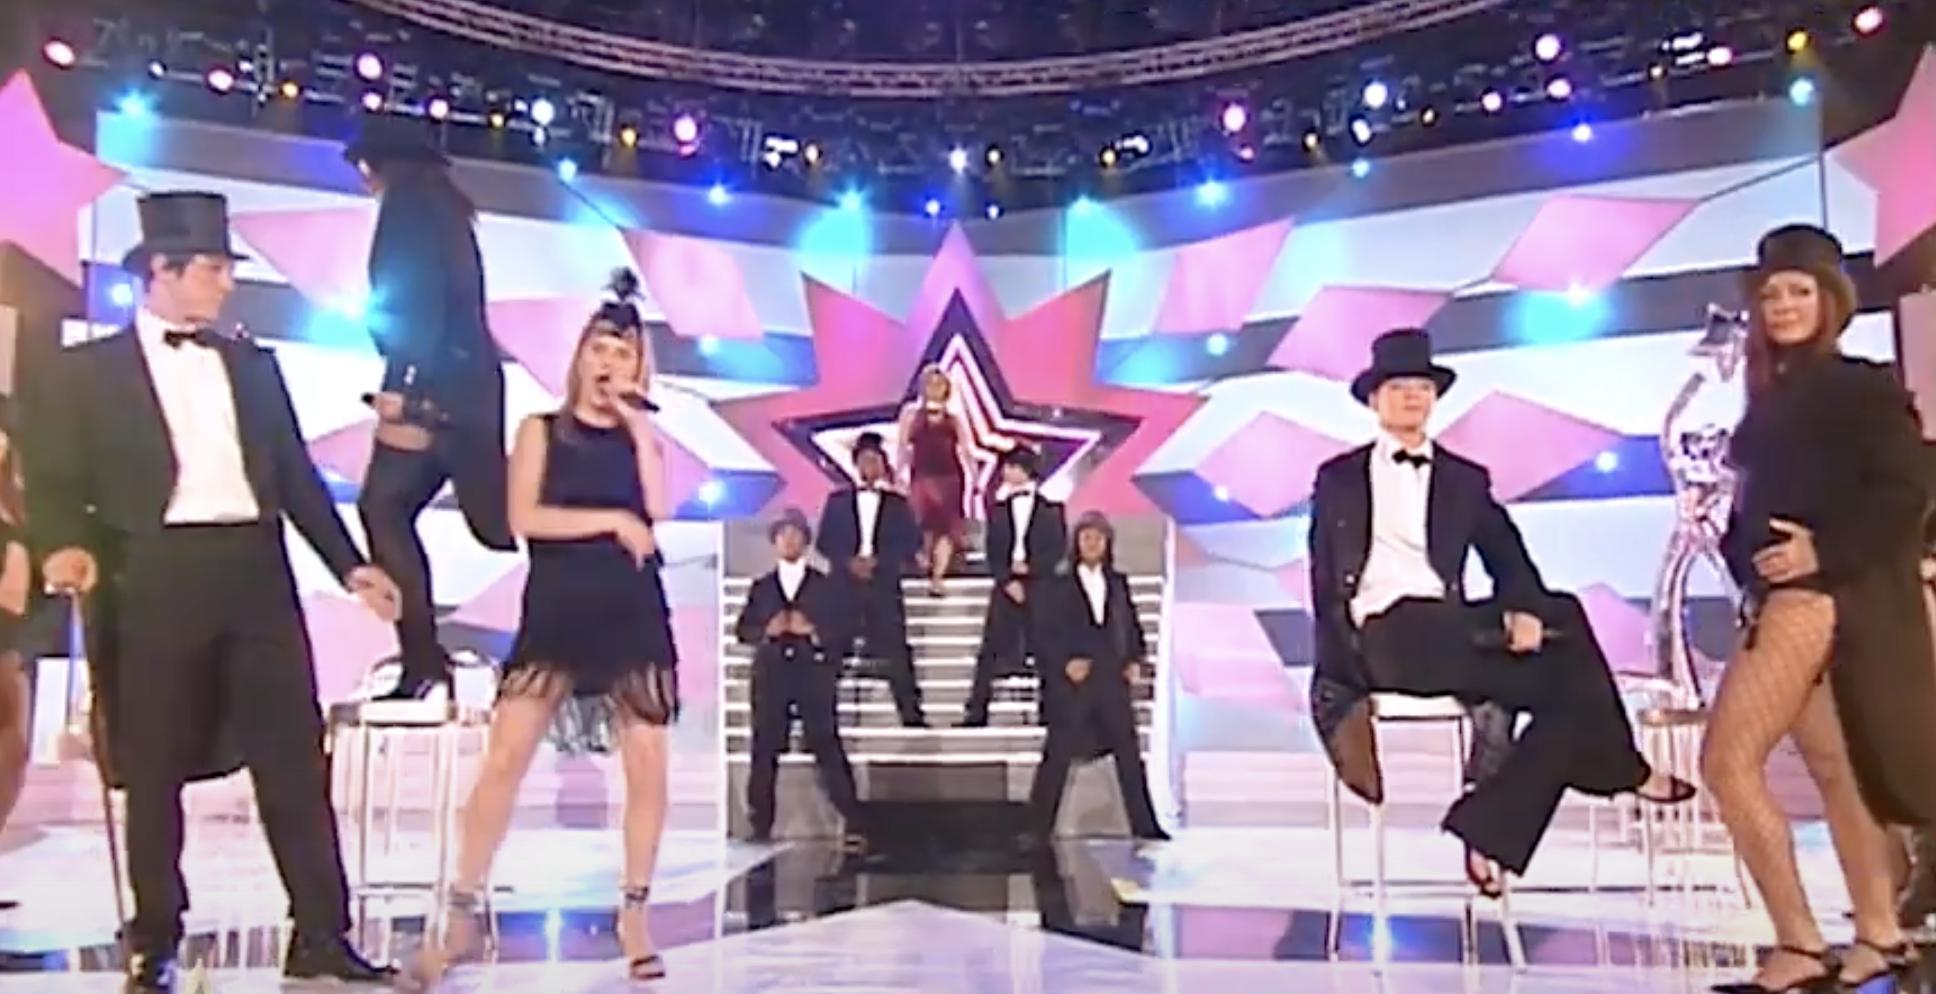 Star academy - danse - plateau - Kamel Ouali - danseuses